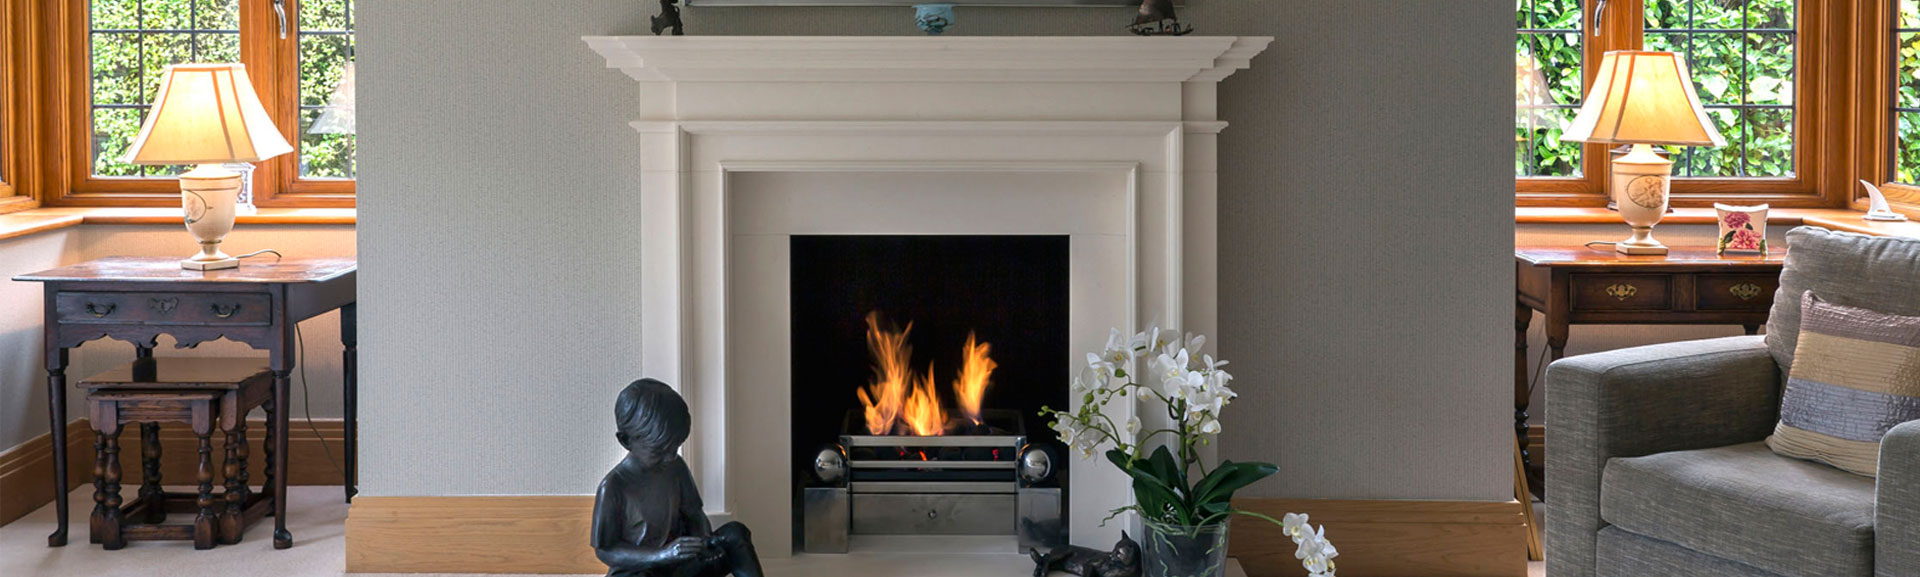 Home depot stone fireplace mental/surround design